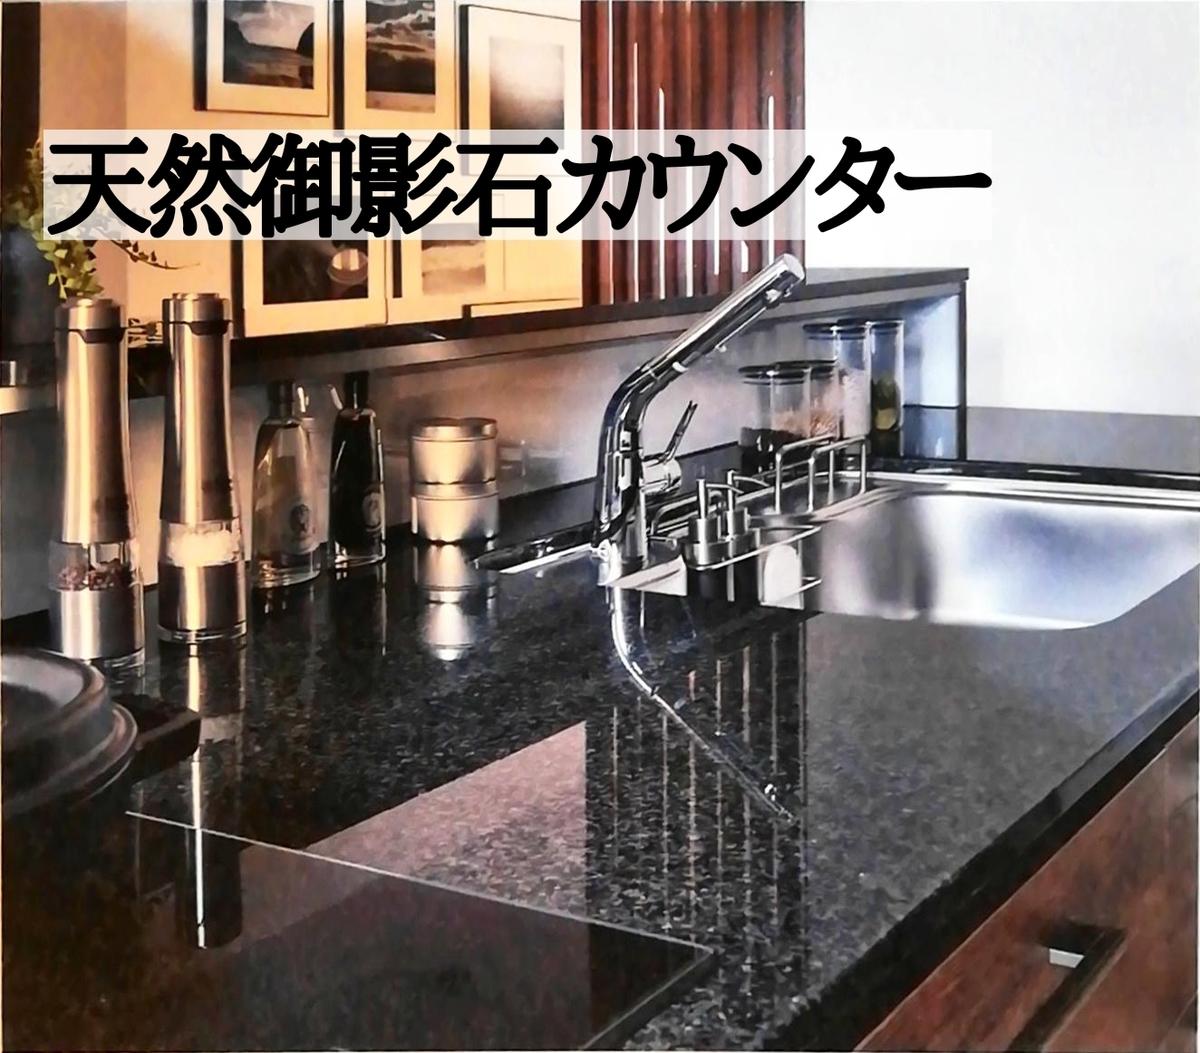 f:id:shioyan1130:20200617062737j:plain